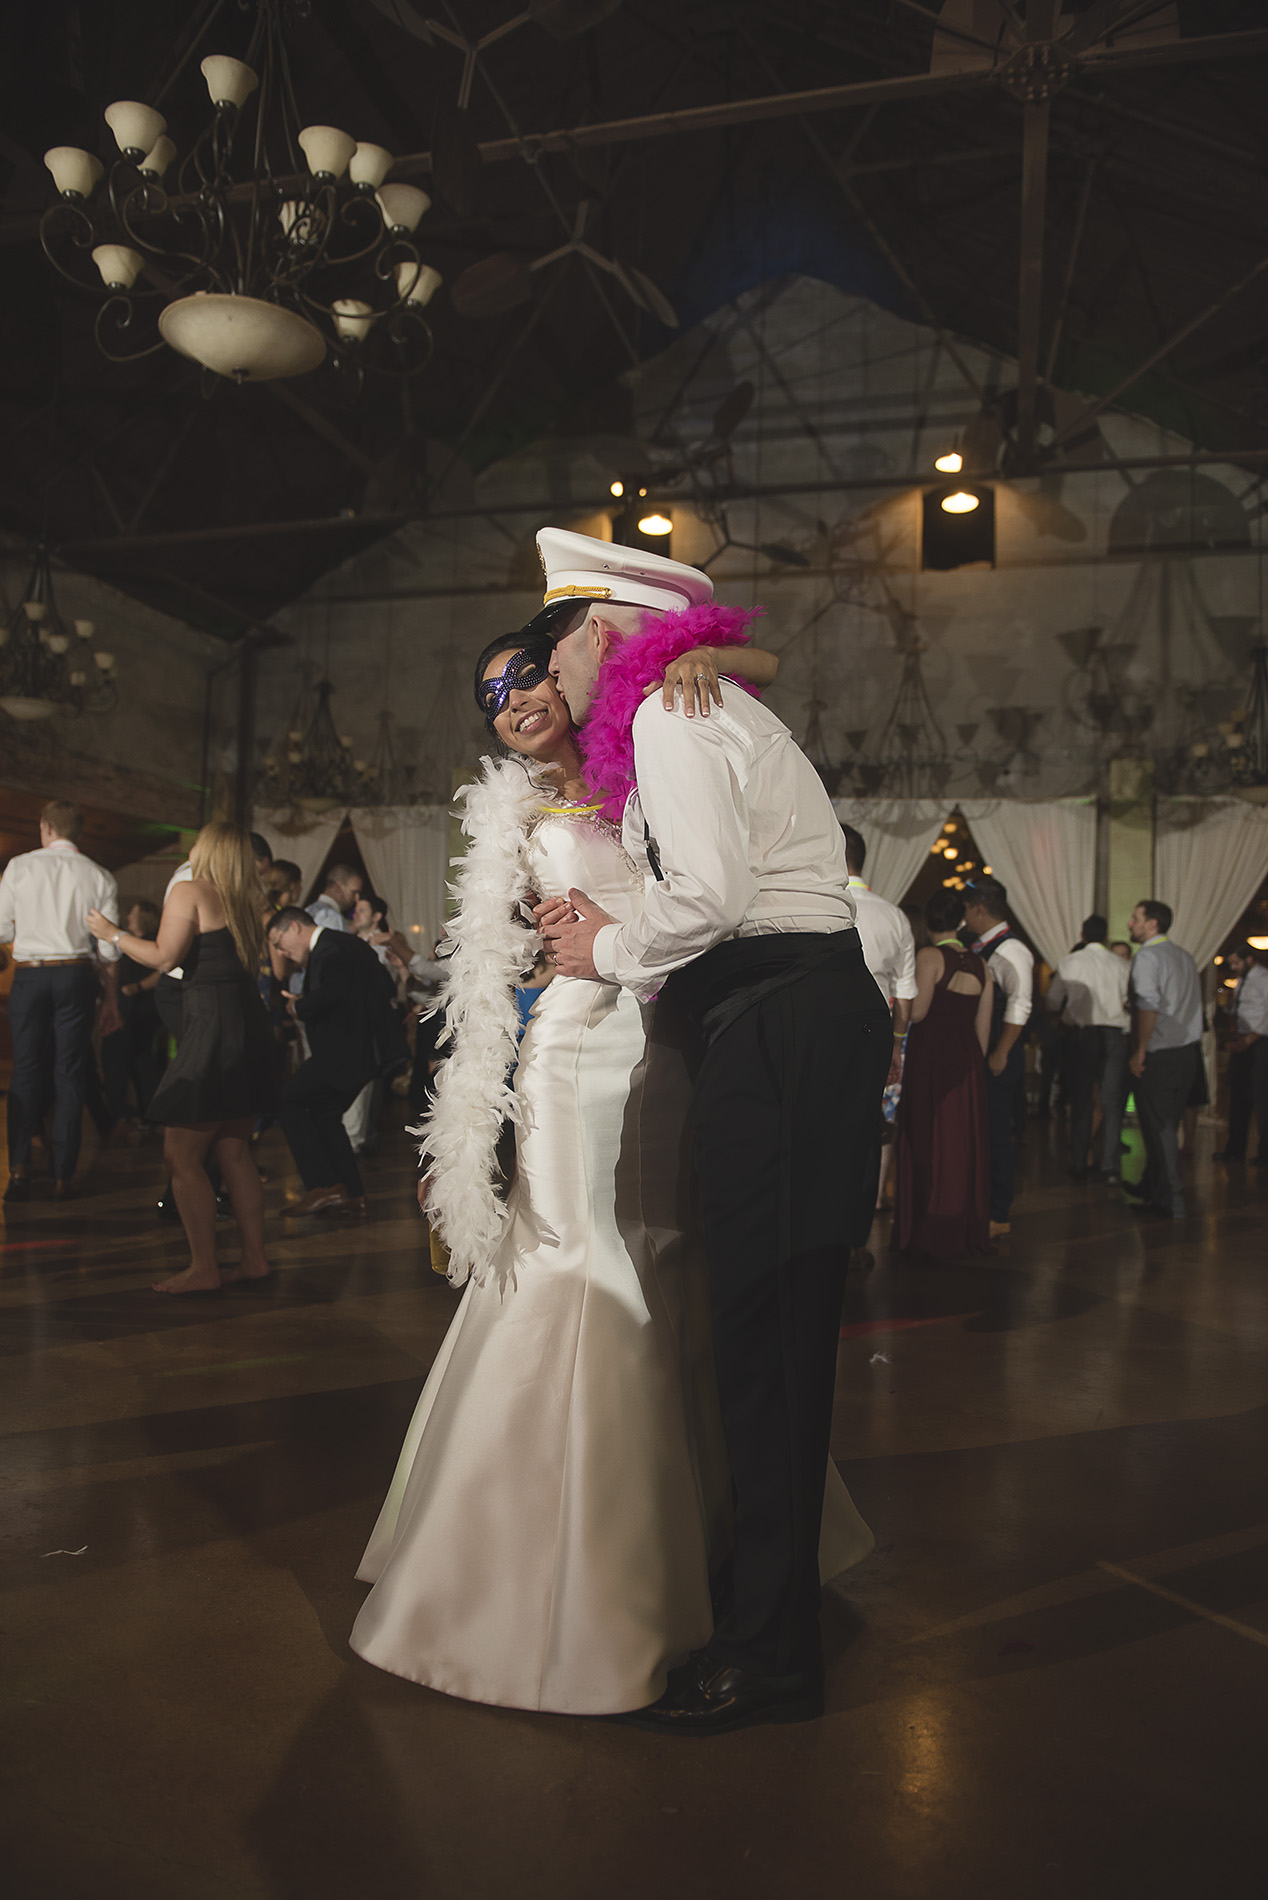 Houston-venue-Olde-Dobbin-Station-Romantic-Classic-Wedding-Photographer-121.jpg